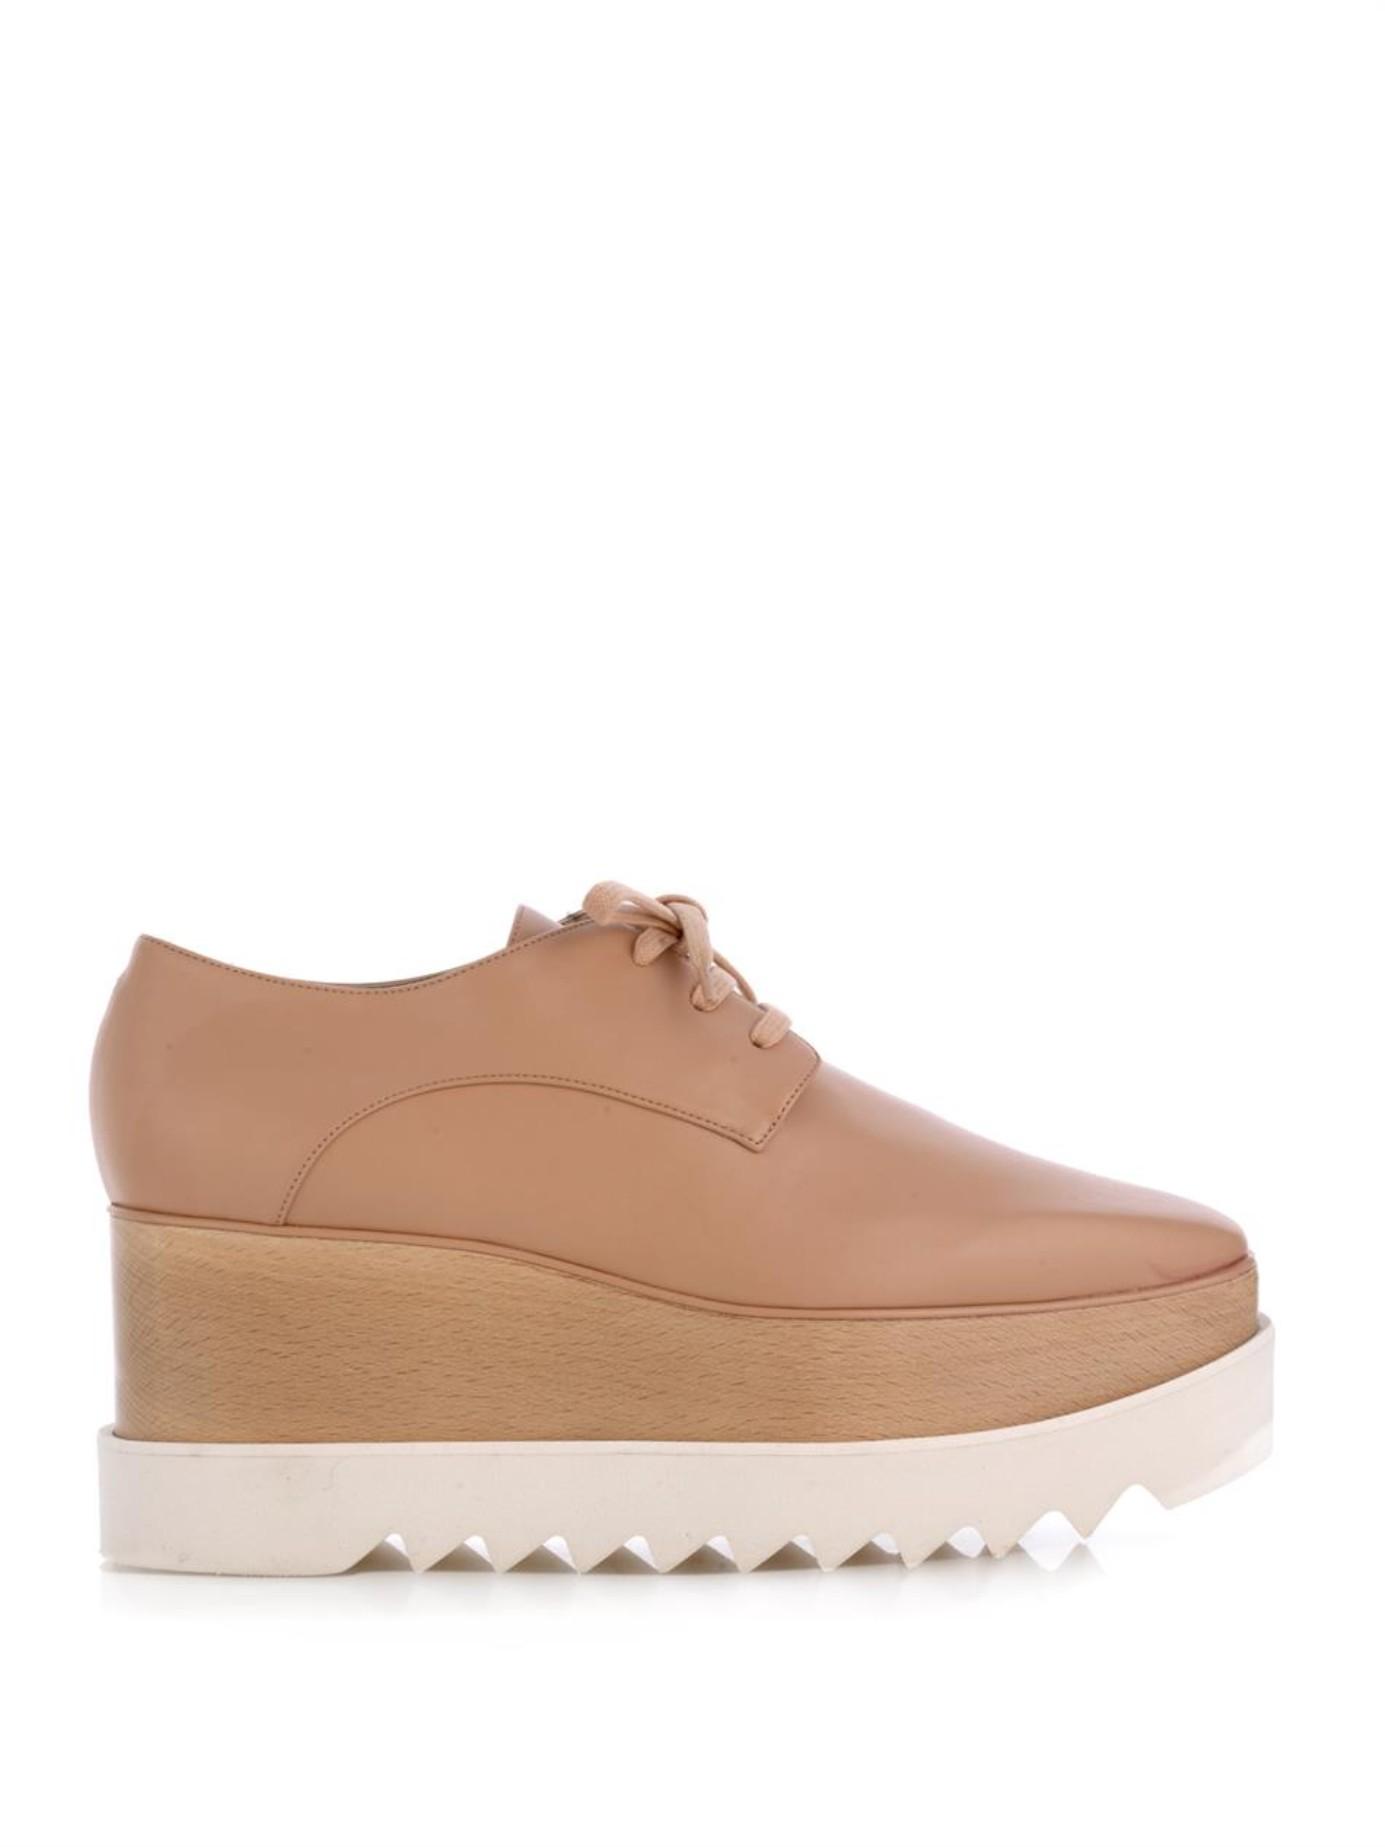 Stella mccartney Britt Lace-Up Platform Shoes in Natural ...